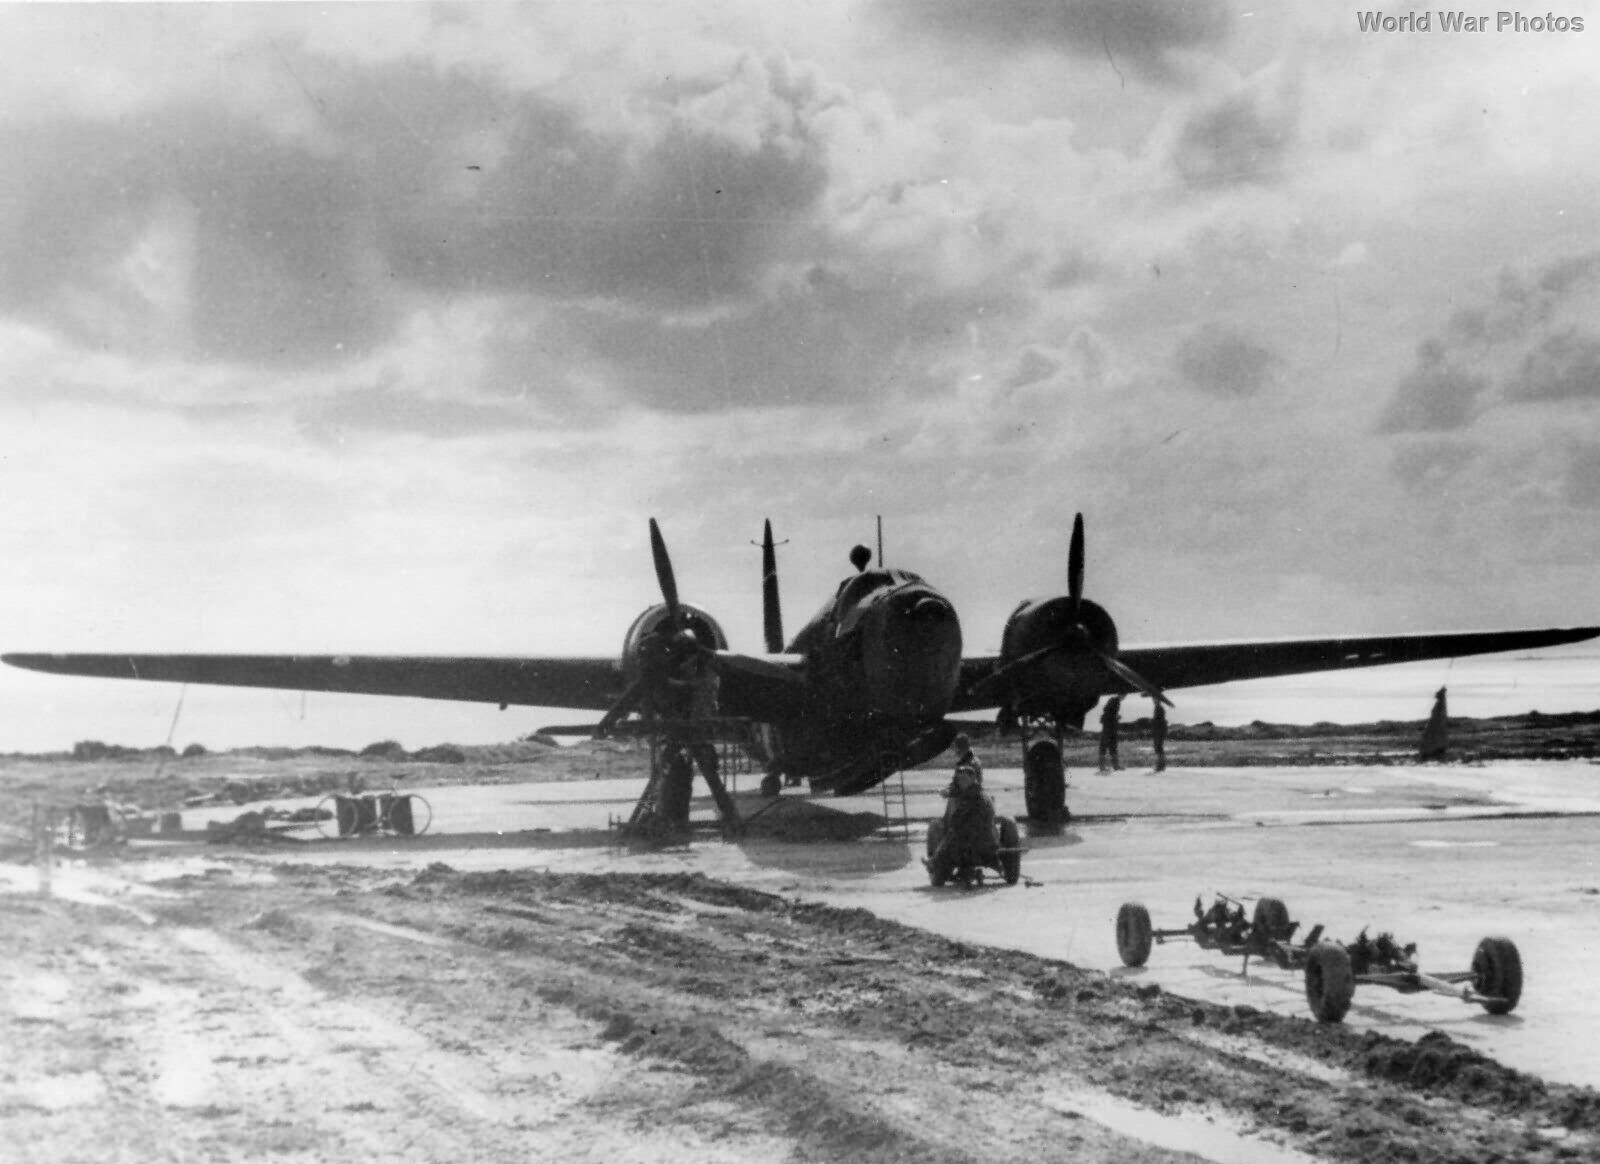 Wellington Mk X Coastal Command of No. 304 Polish Bomber Squadron August 1943